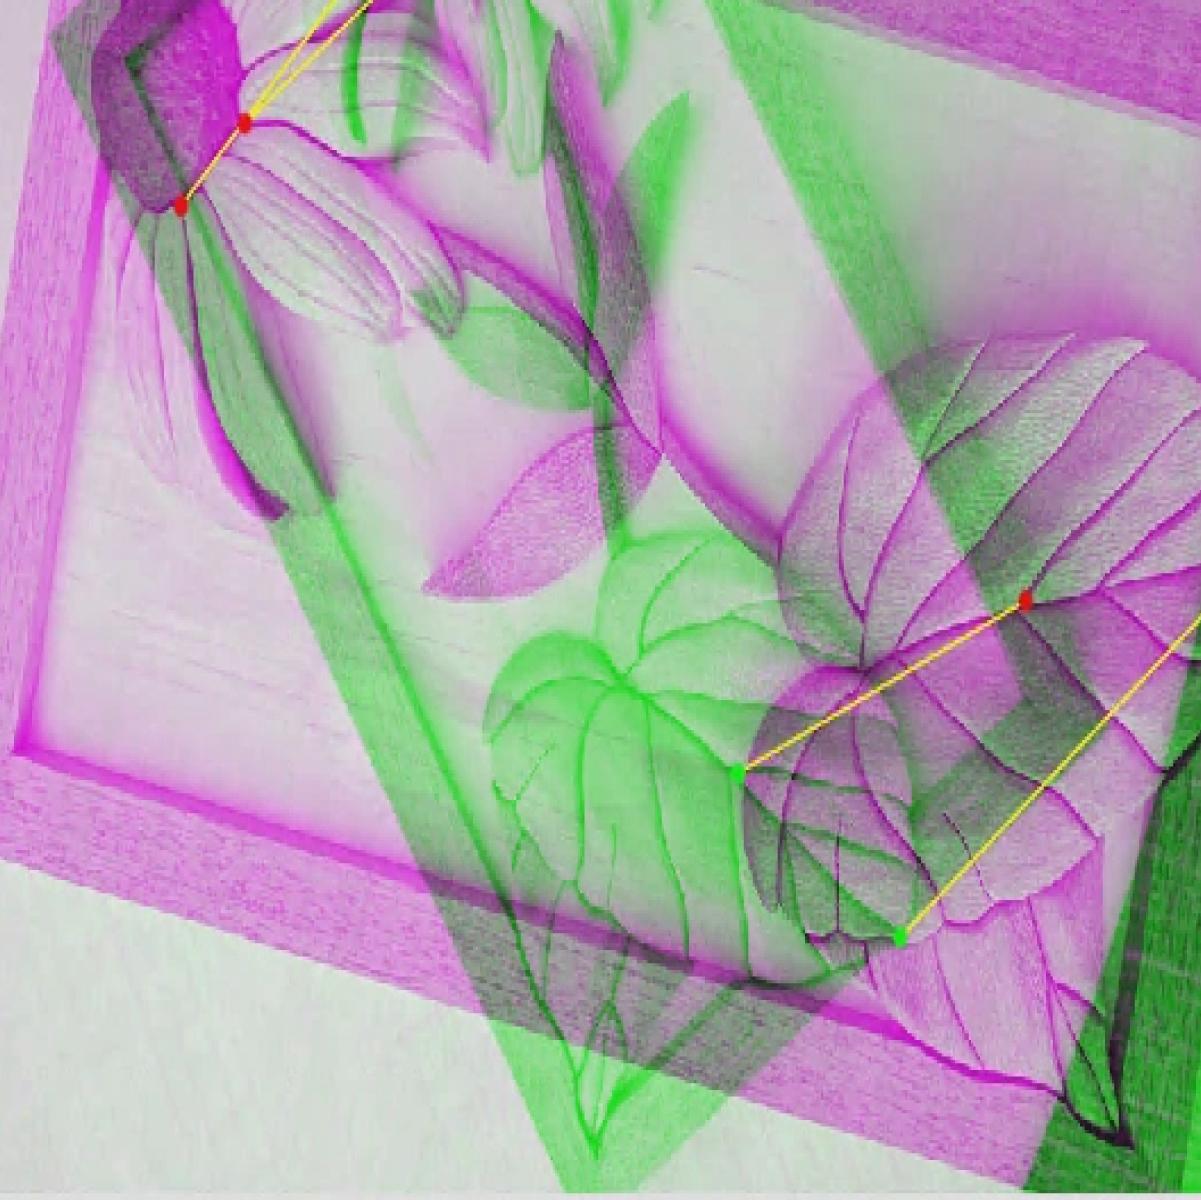 Image Registration using Matlab 1